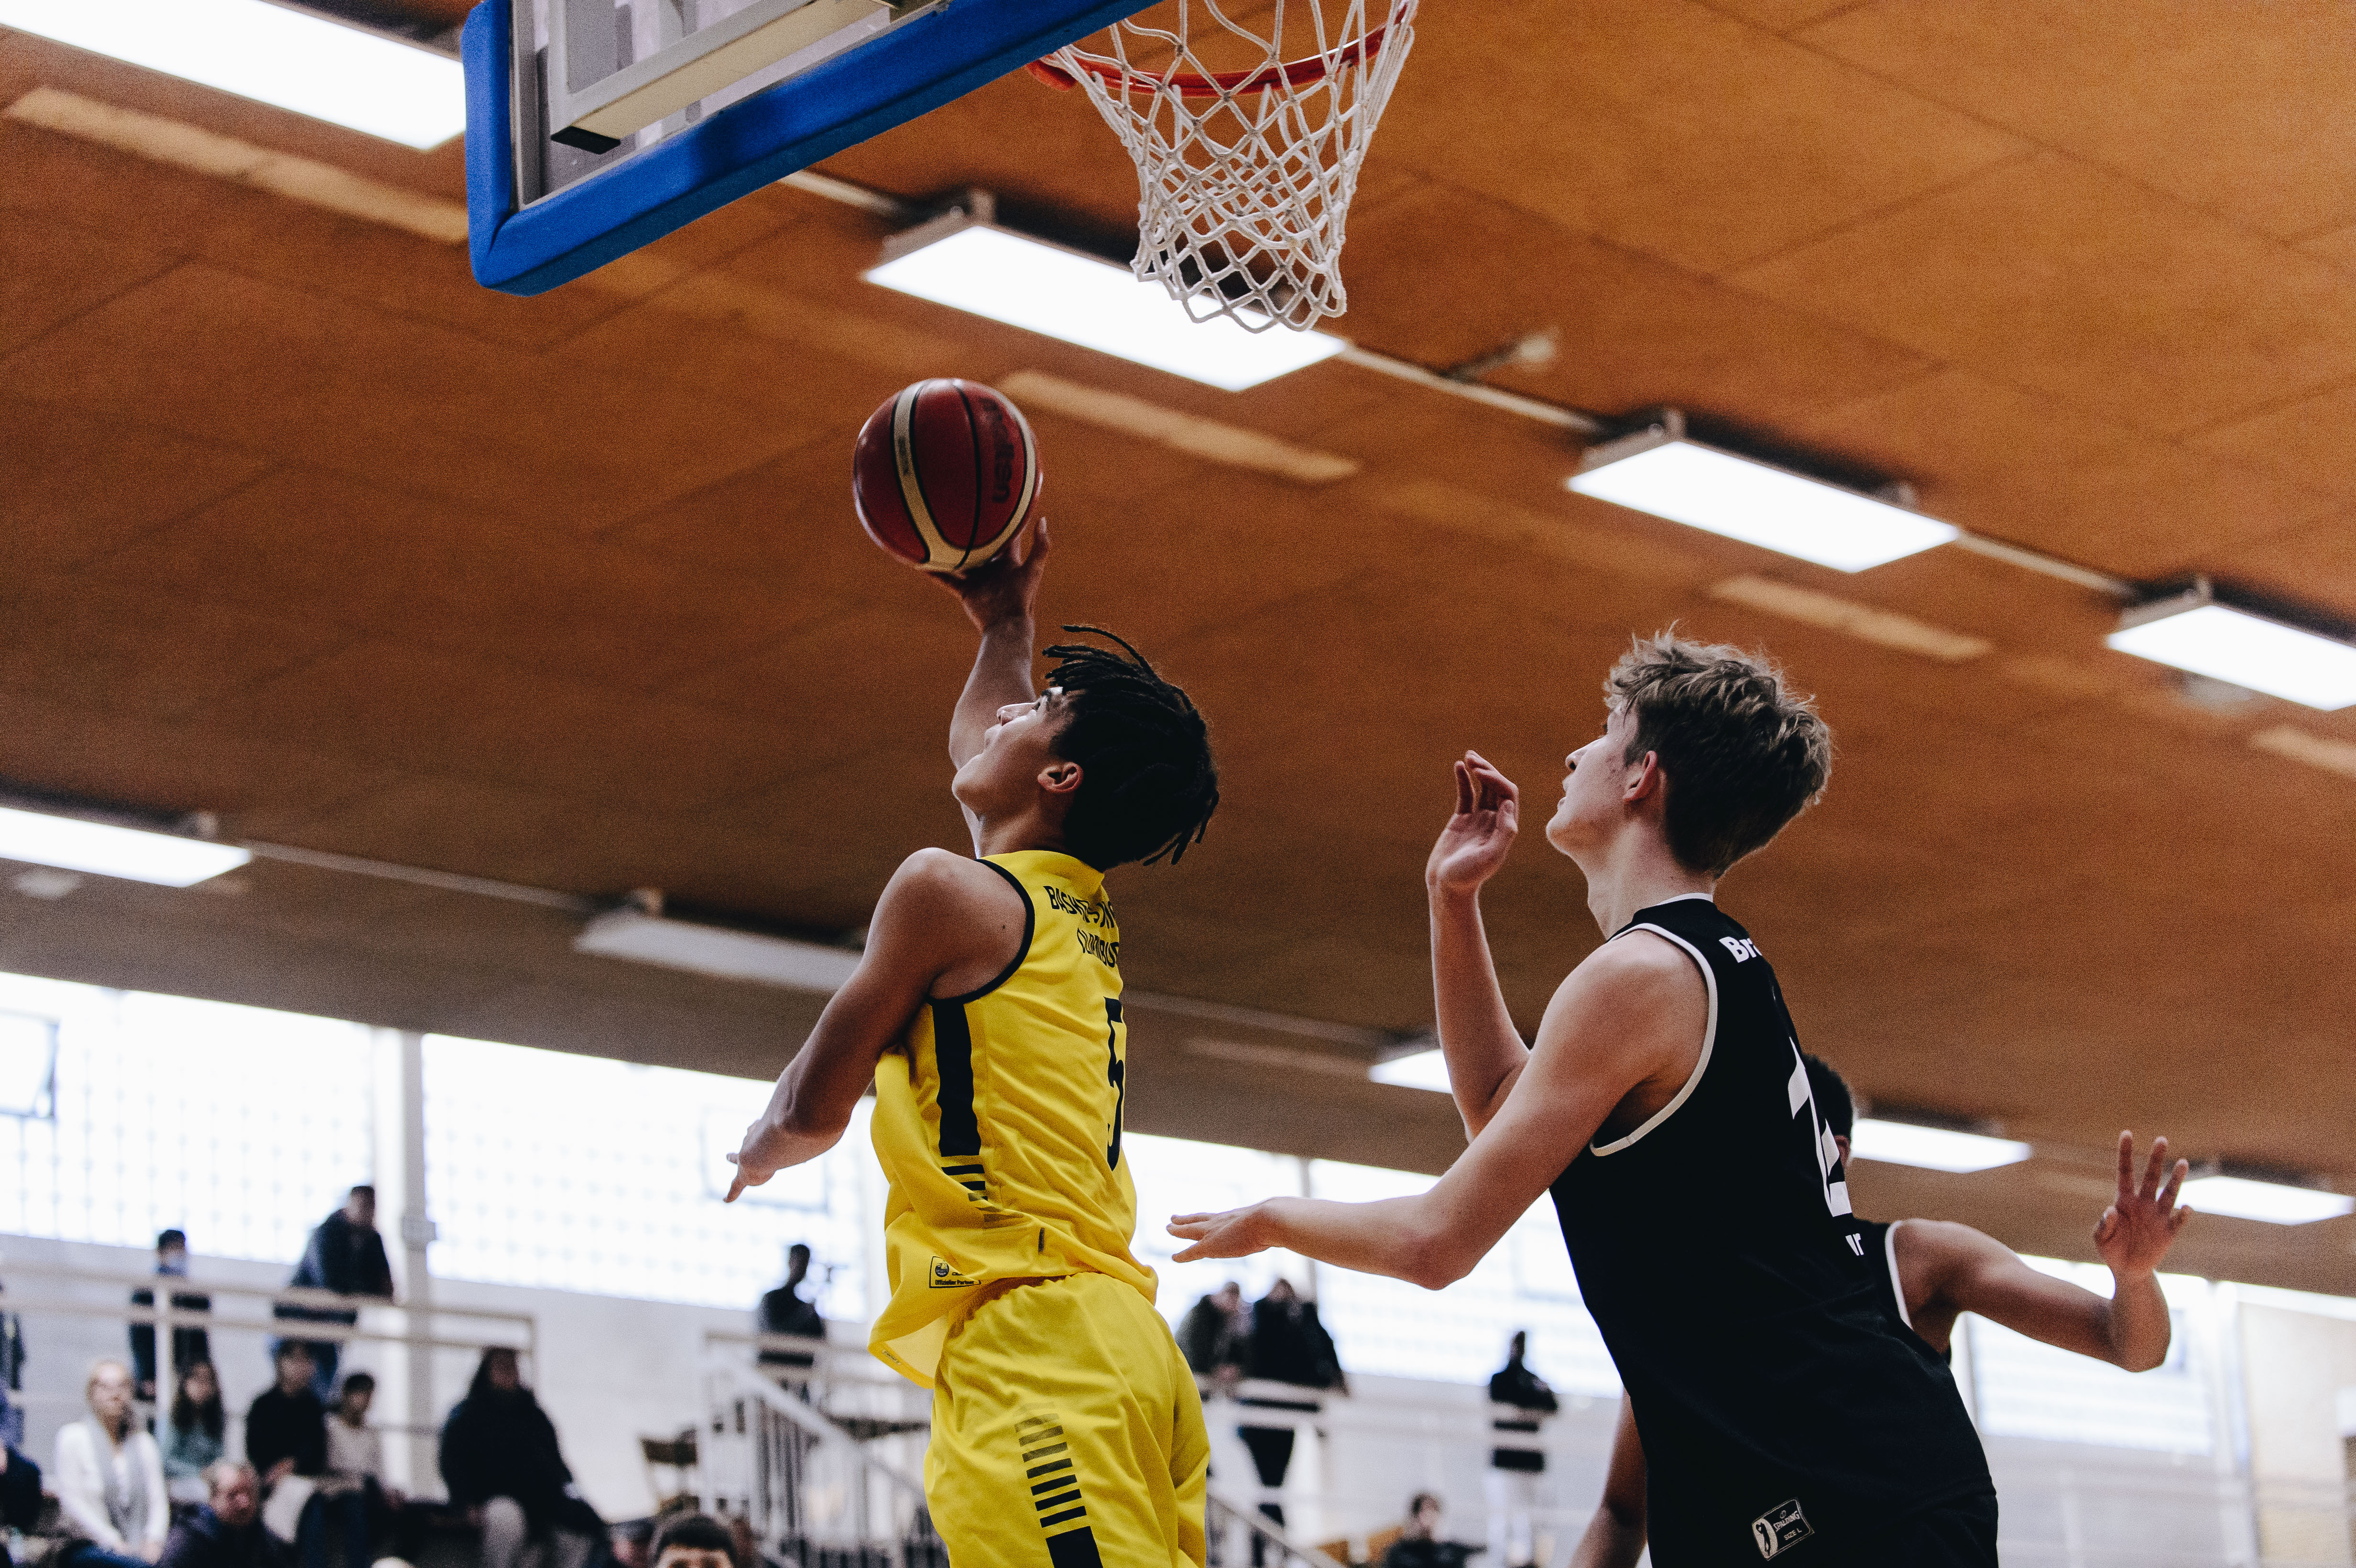 18.10.2020, Oldenburg, Sporthalle Haarenufer: Miles OSEI KOFI (#5 Baskets Juniors Oldenburg) beim JBBL-Spiel EWE Baskets Juniors - Bramfelder SV. Foto: Erik Hillmer